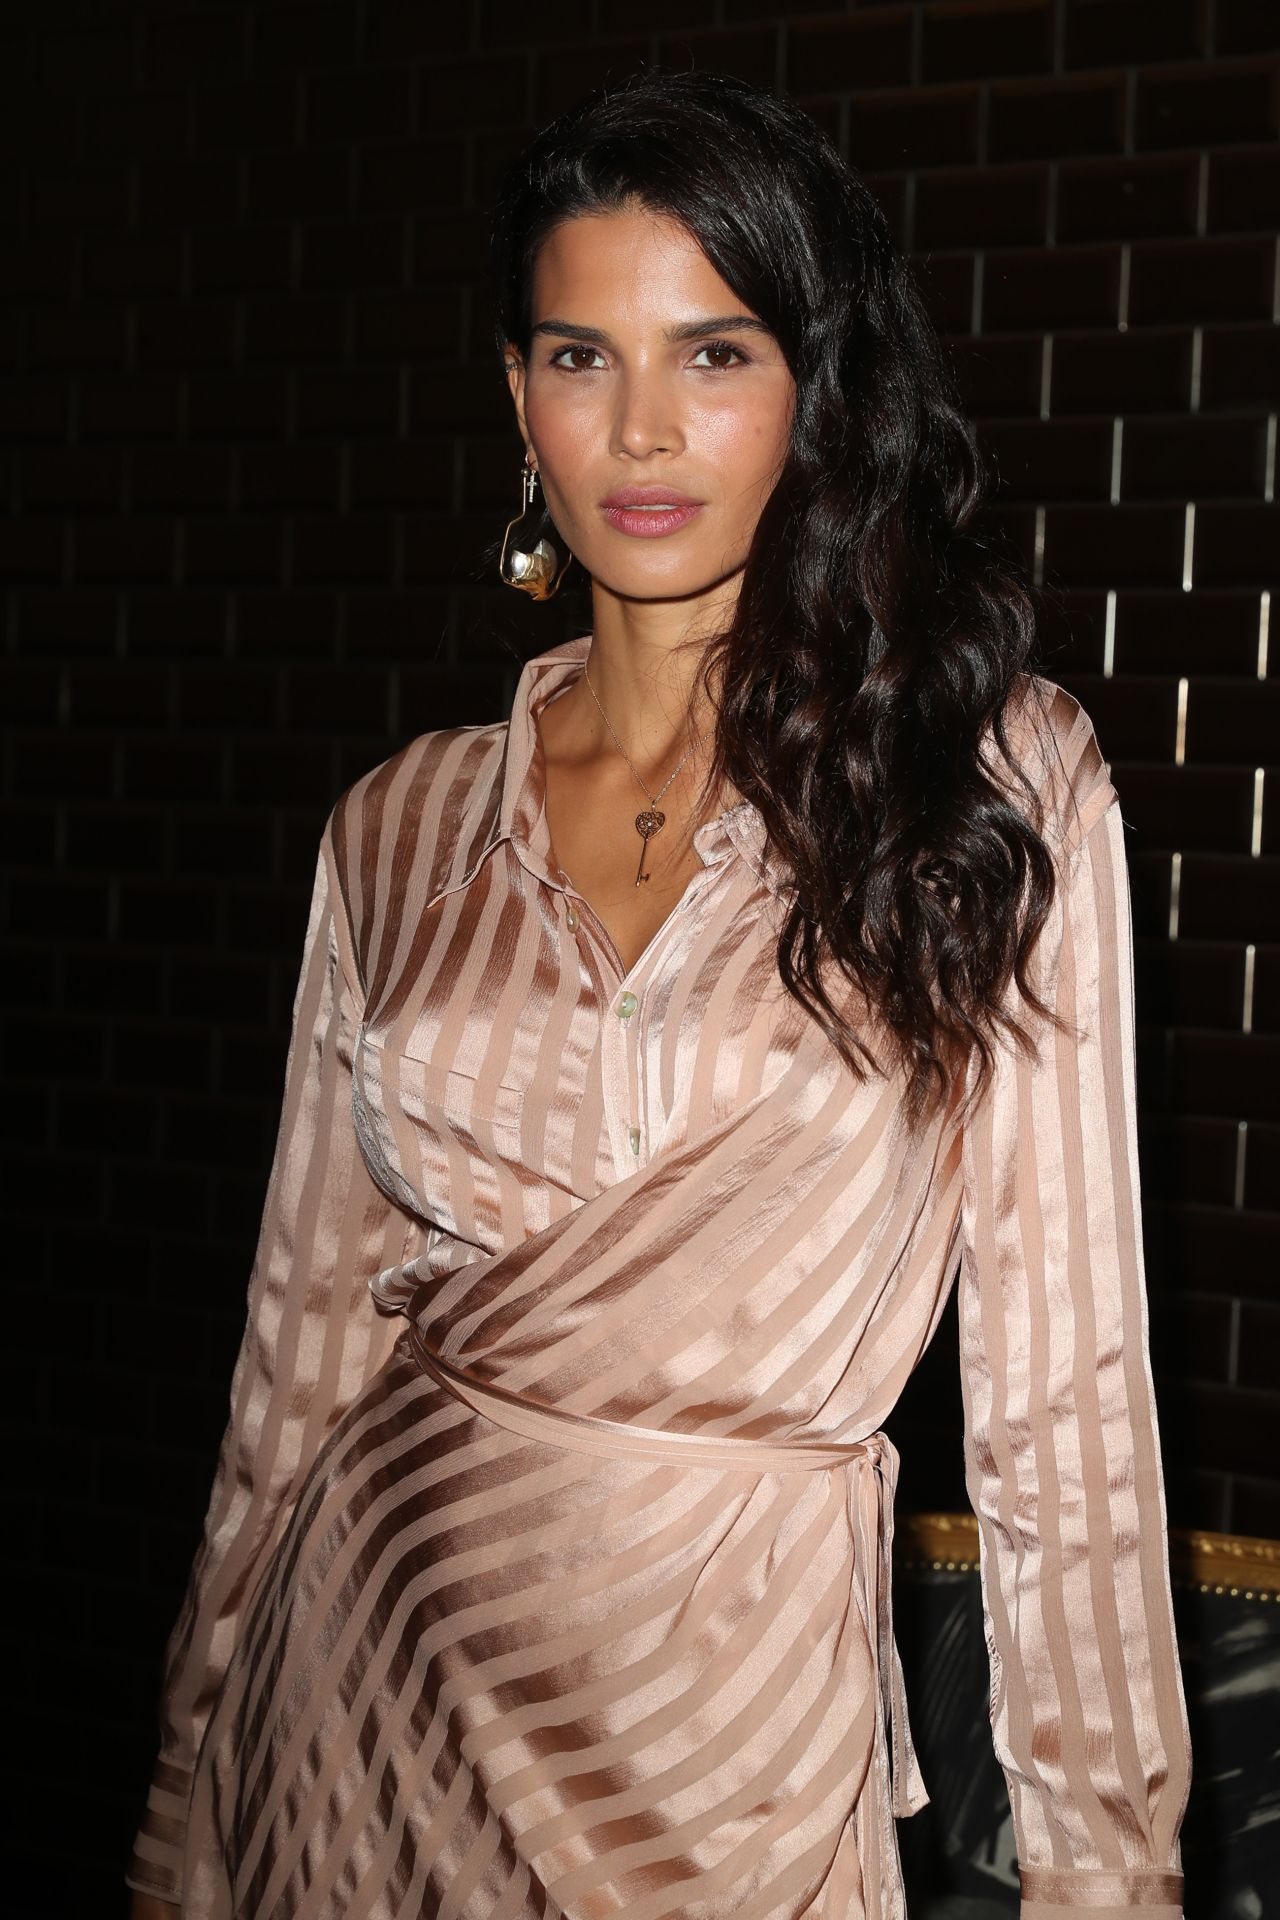 Raica Oliveira At Jean Paul Gaultier Fashion Show In Paris